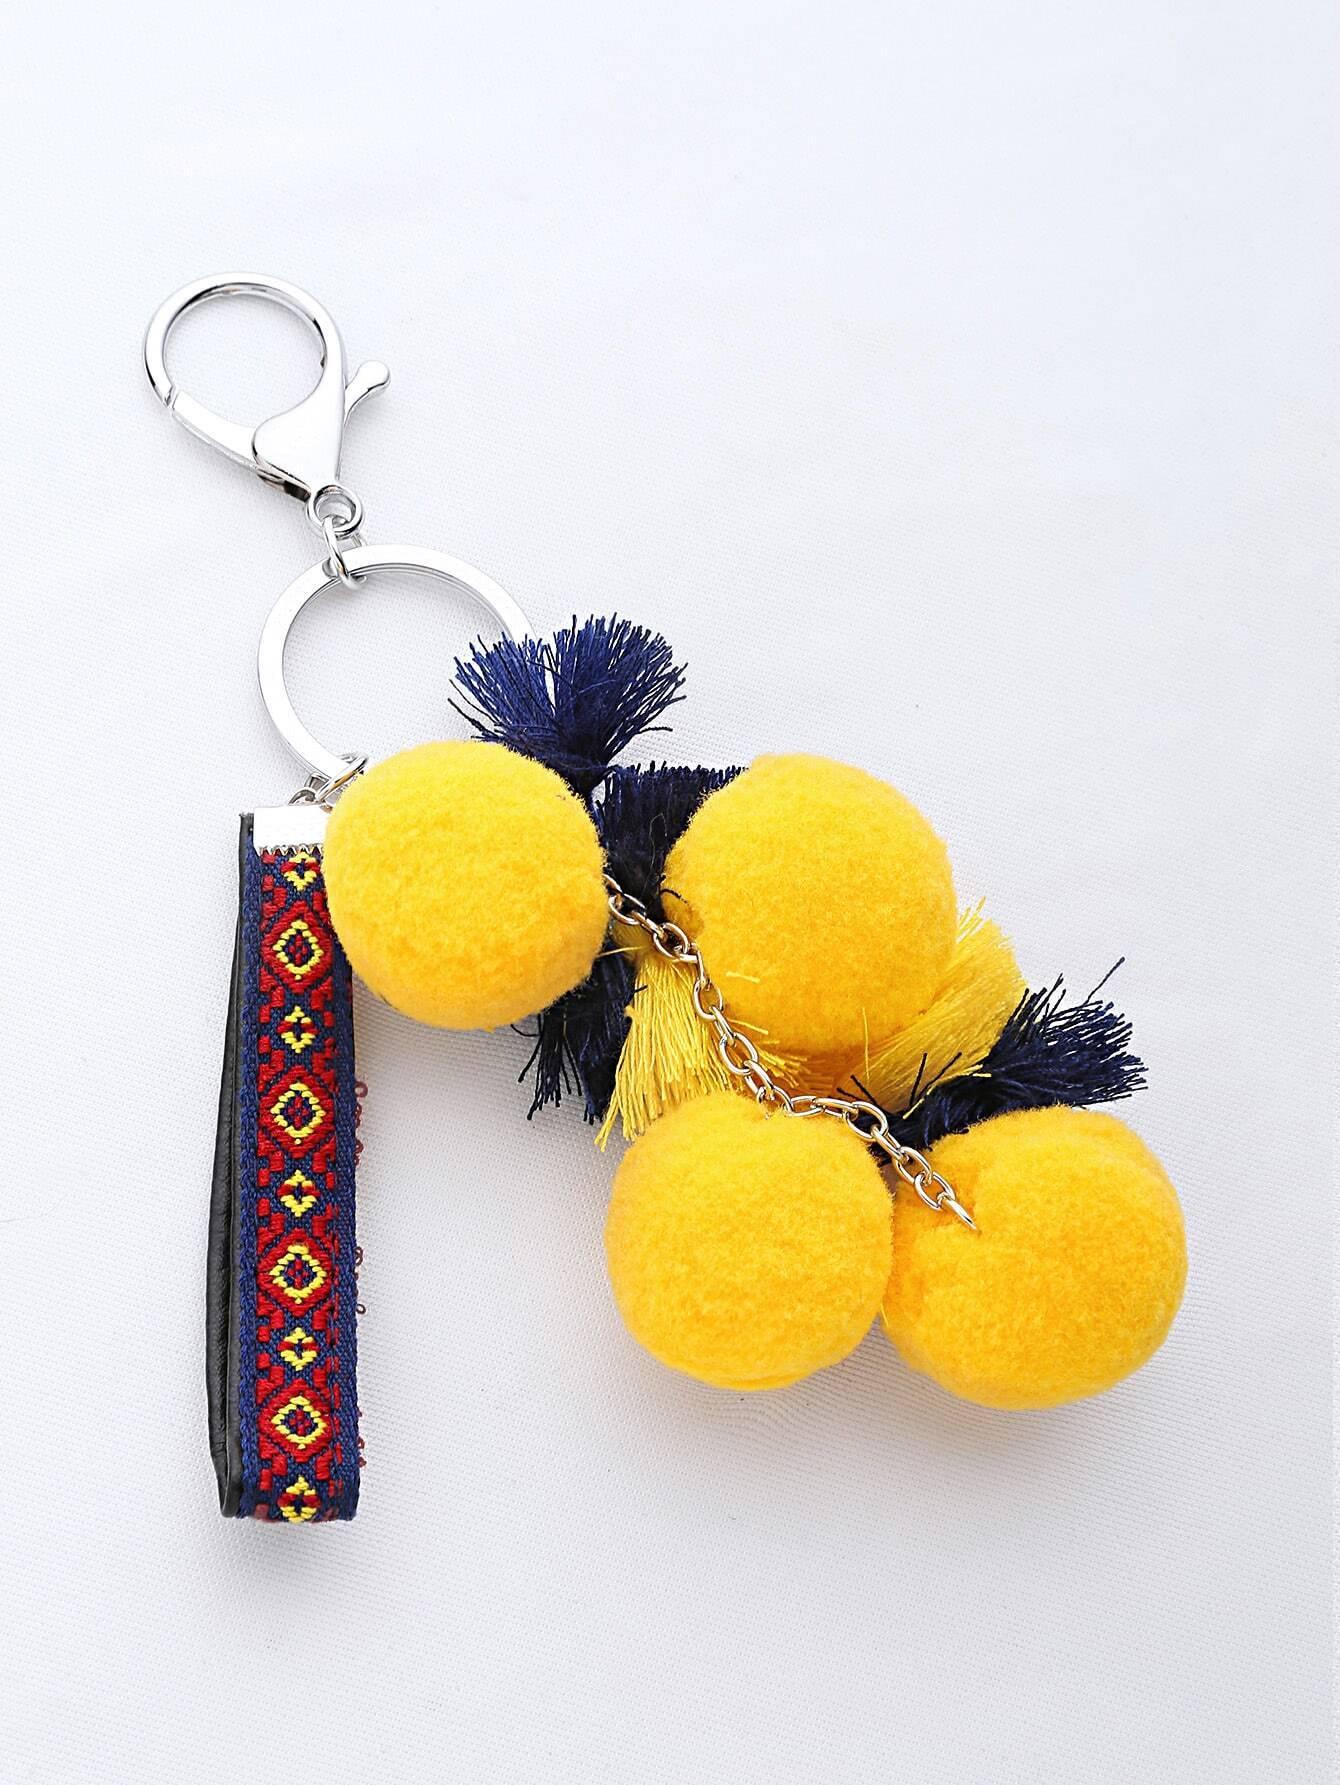 keychain170406302_2